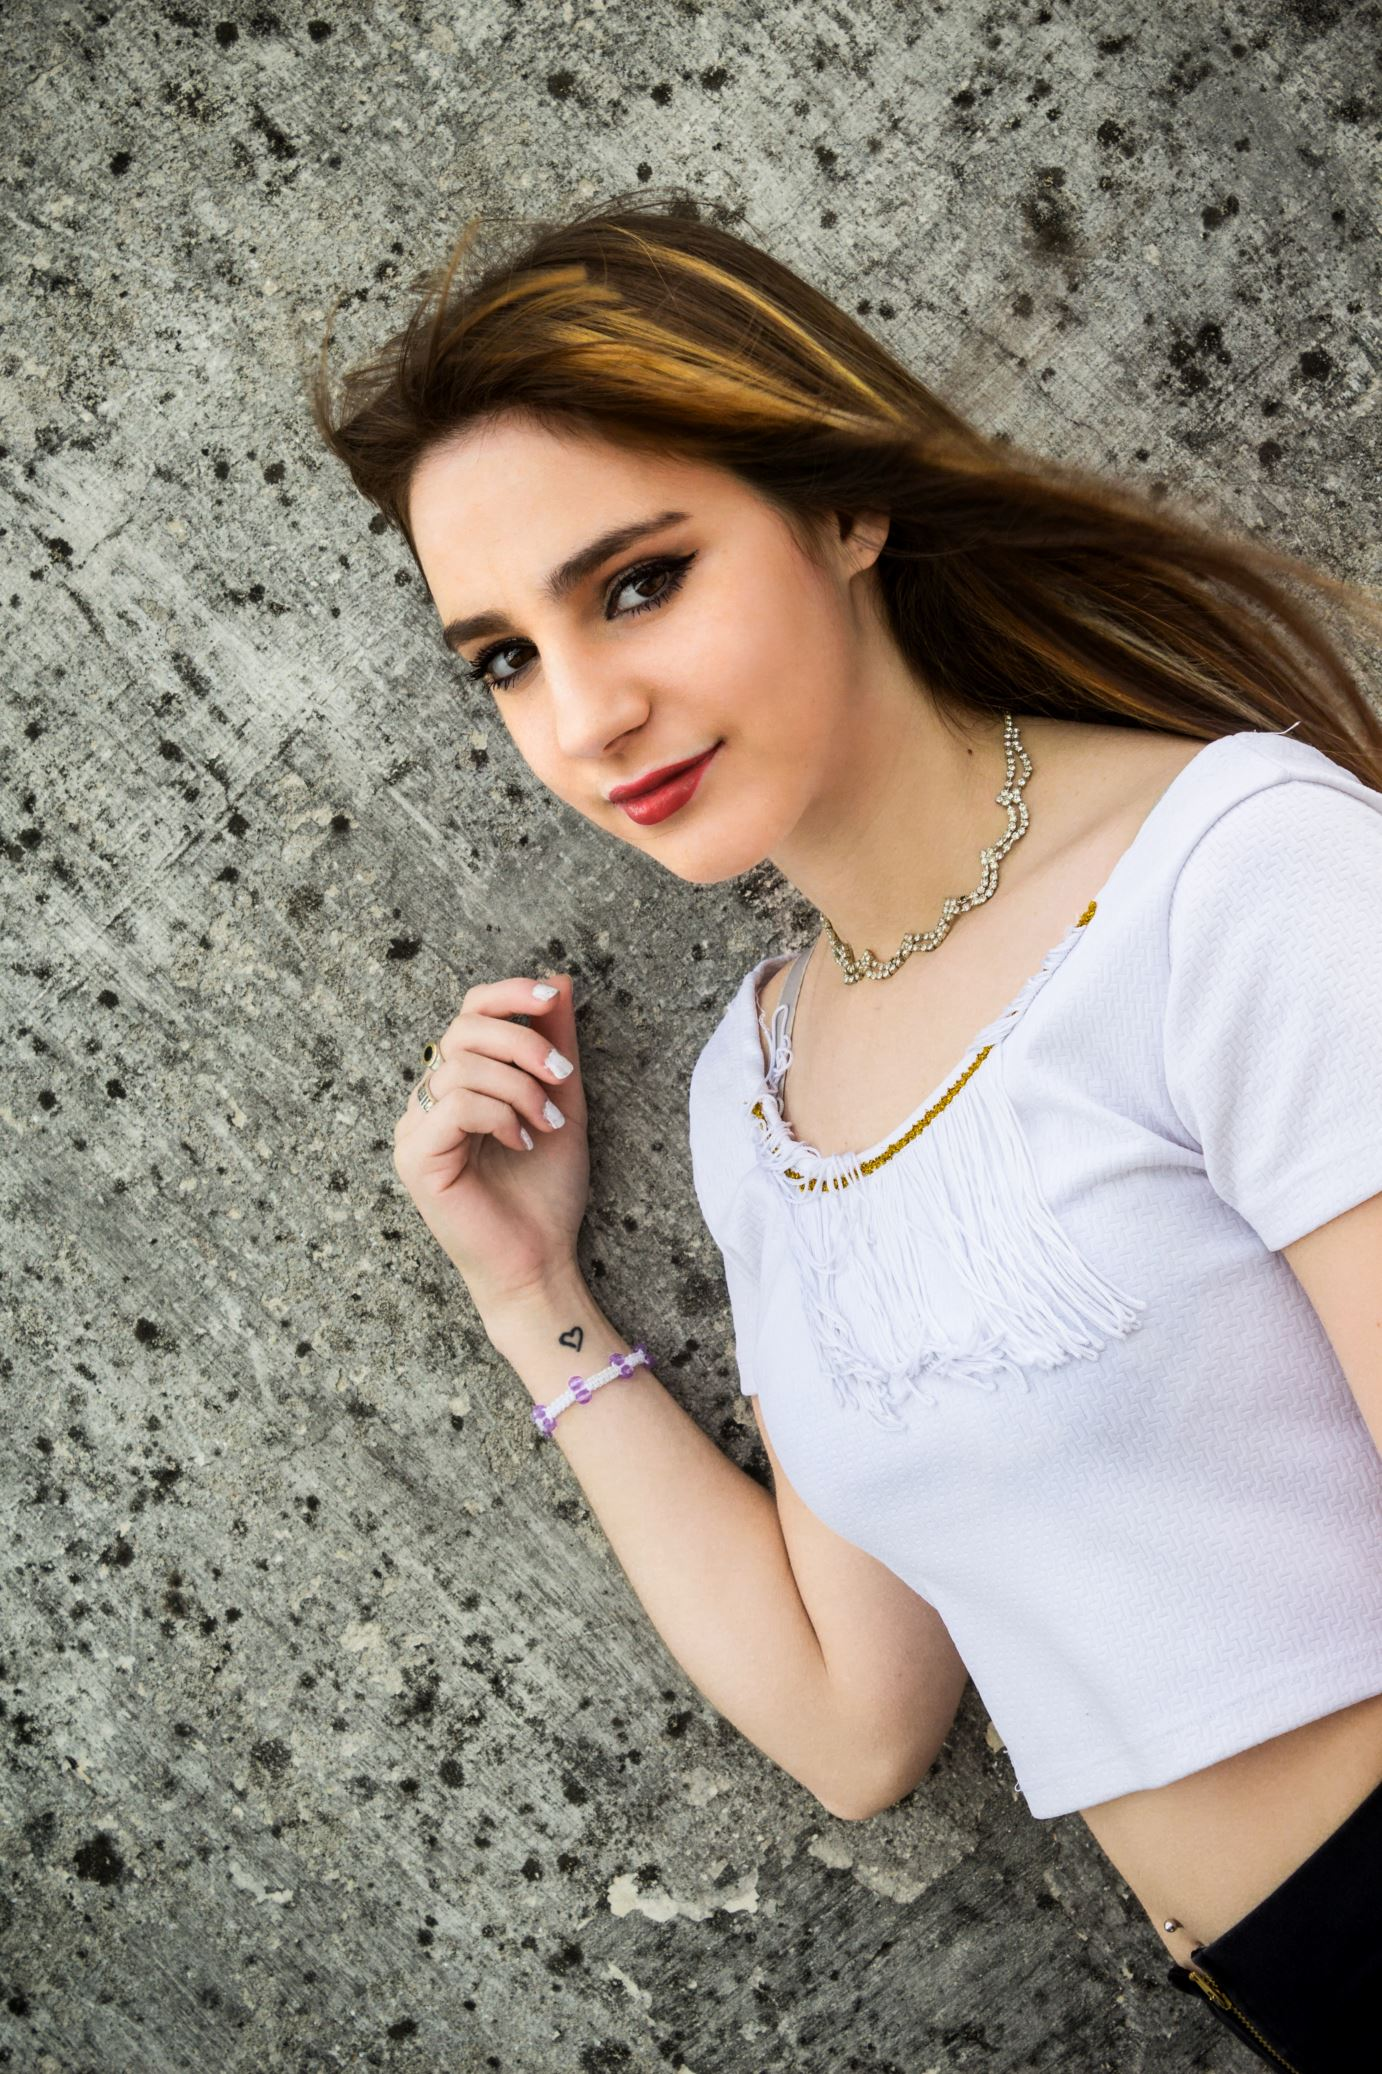 Tatiana #9